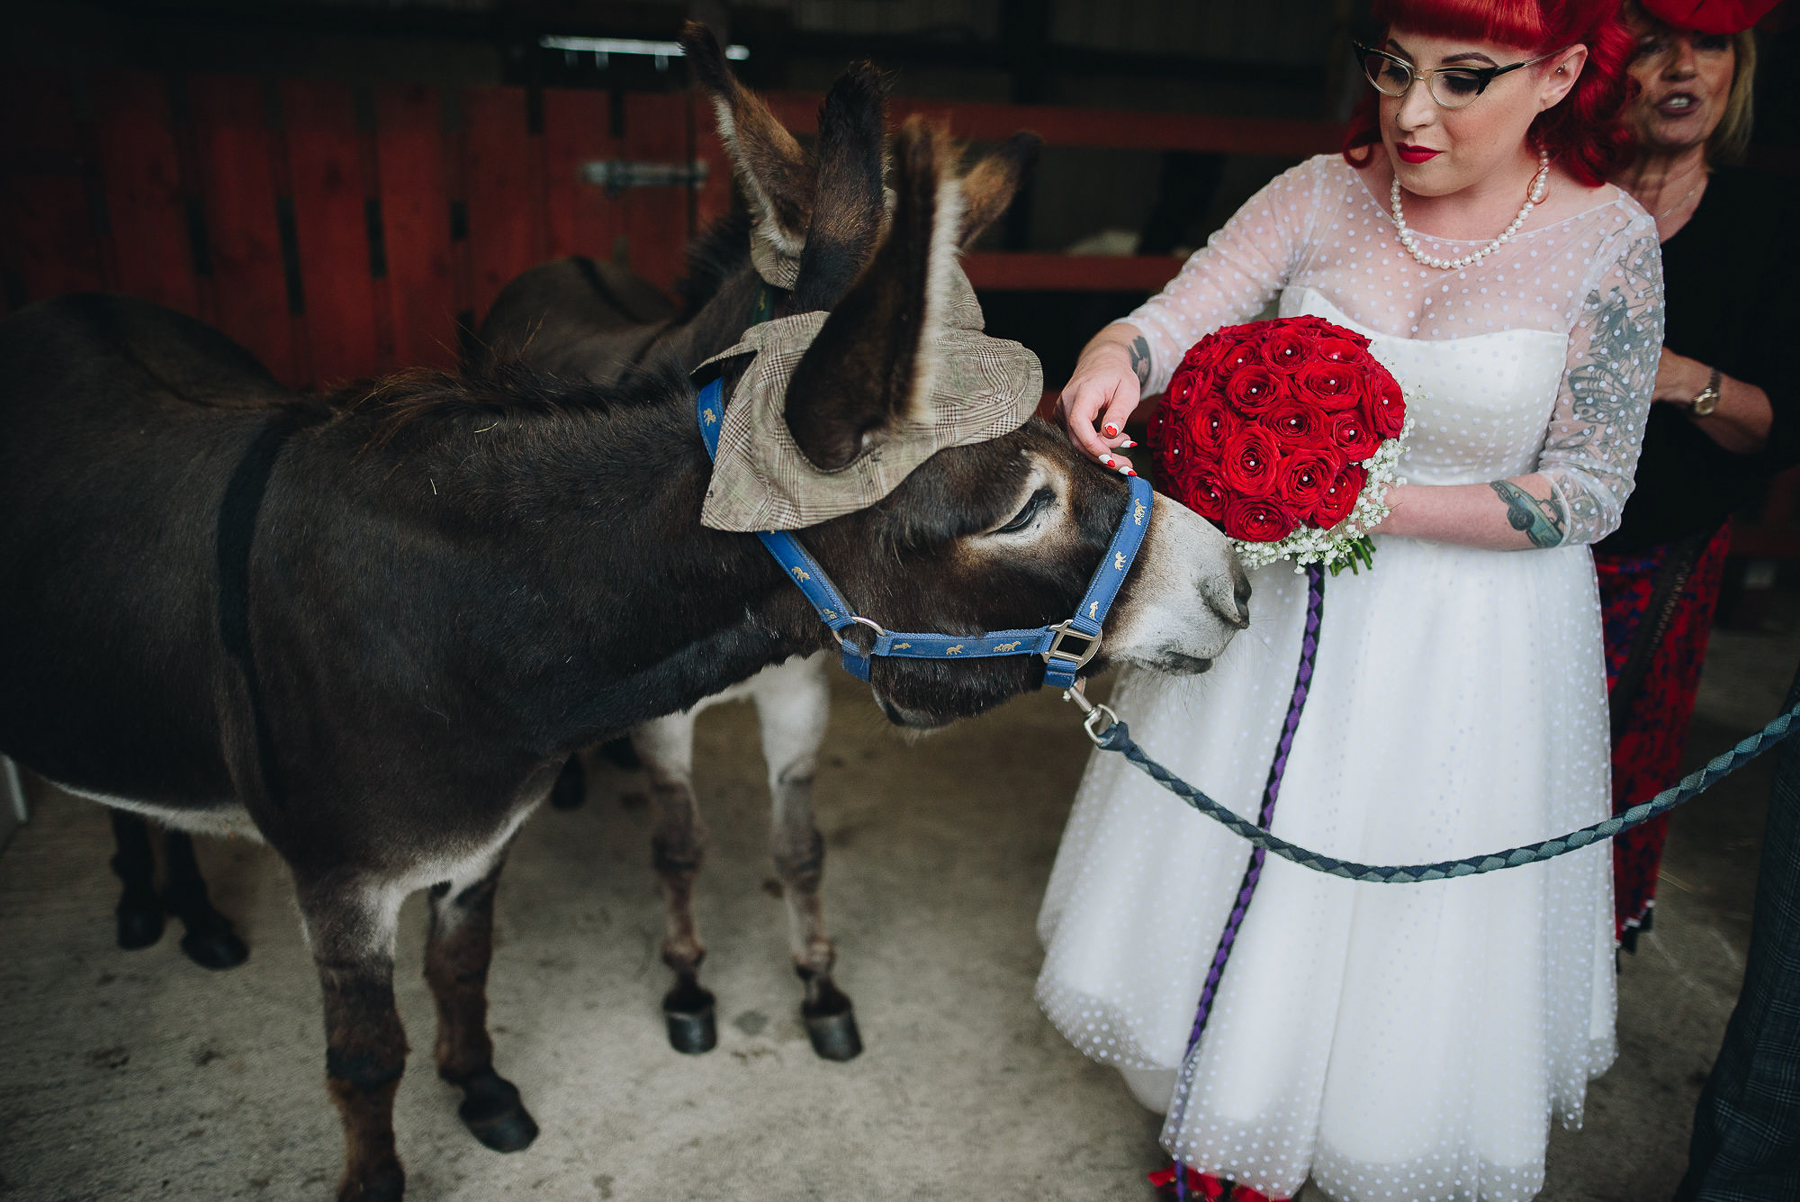 Wellbeing_Farm_Wedding_Photography_The_Pin-Up_Bride_Lara_Shaun-82.jpg